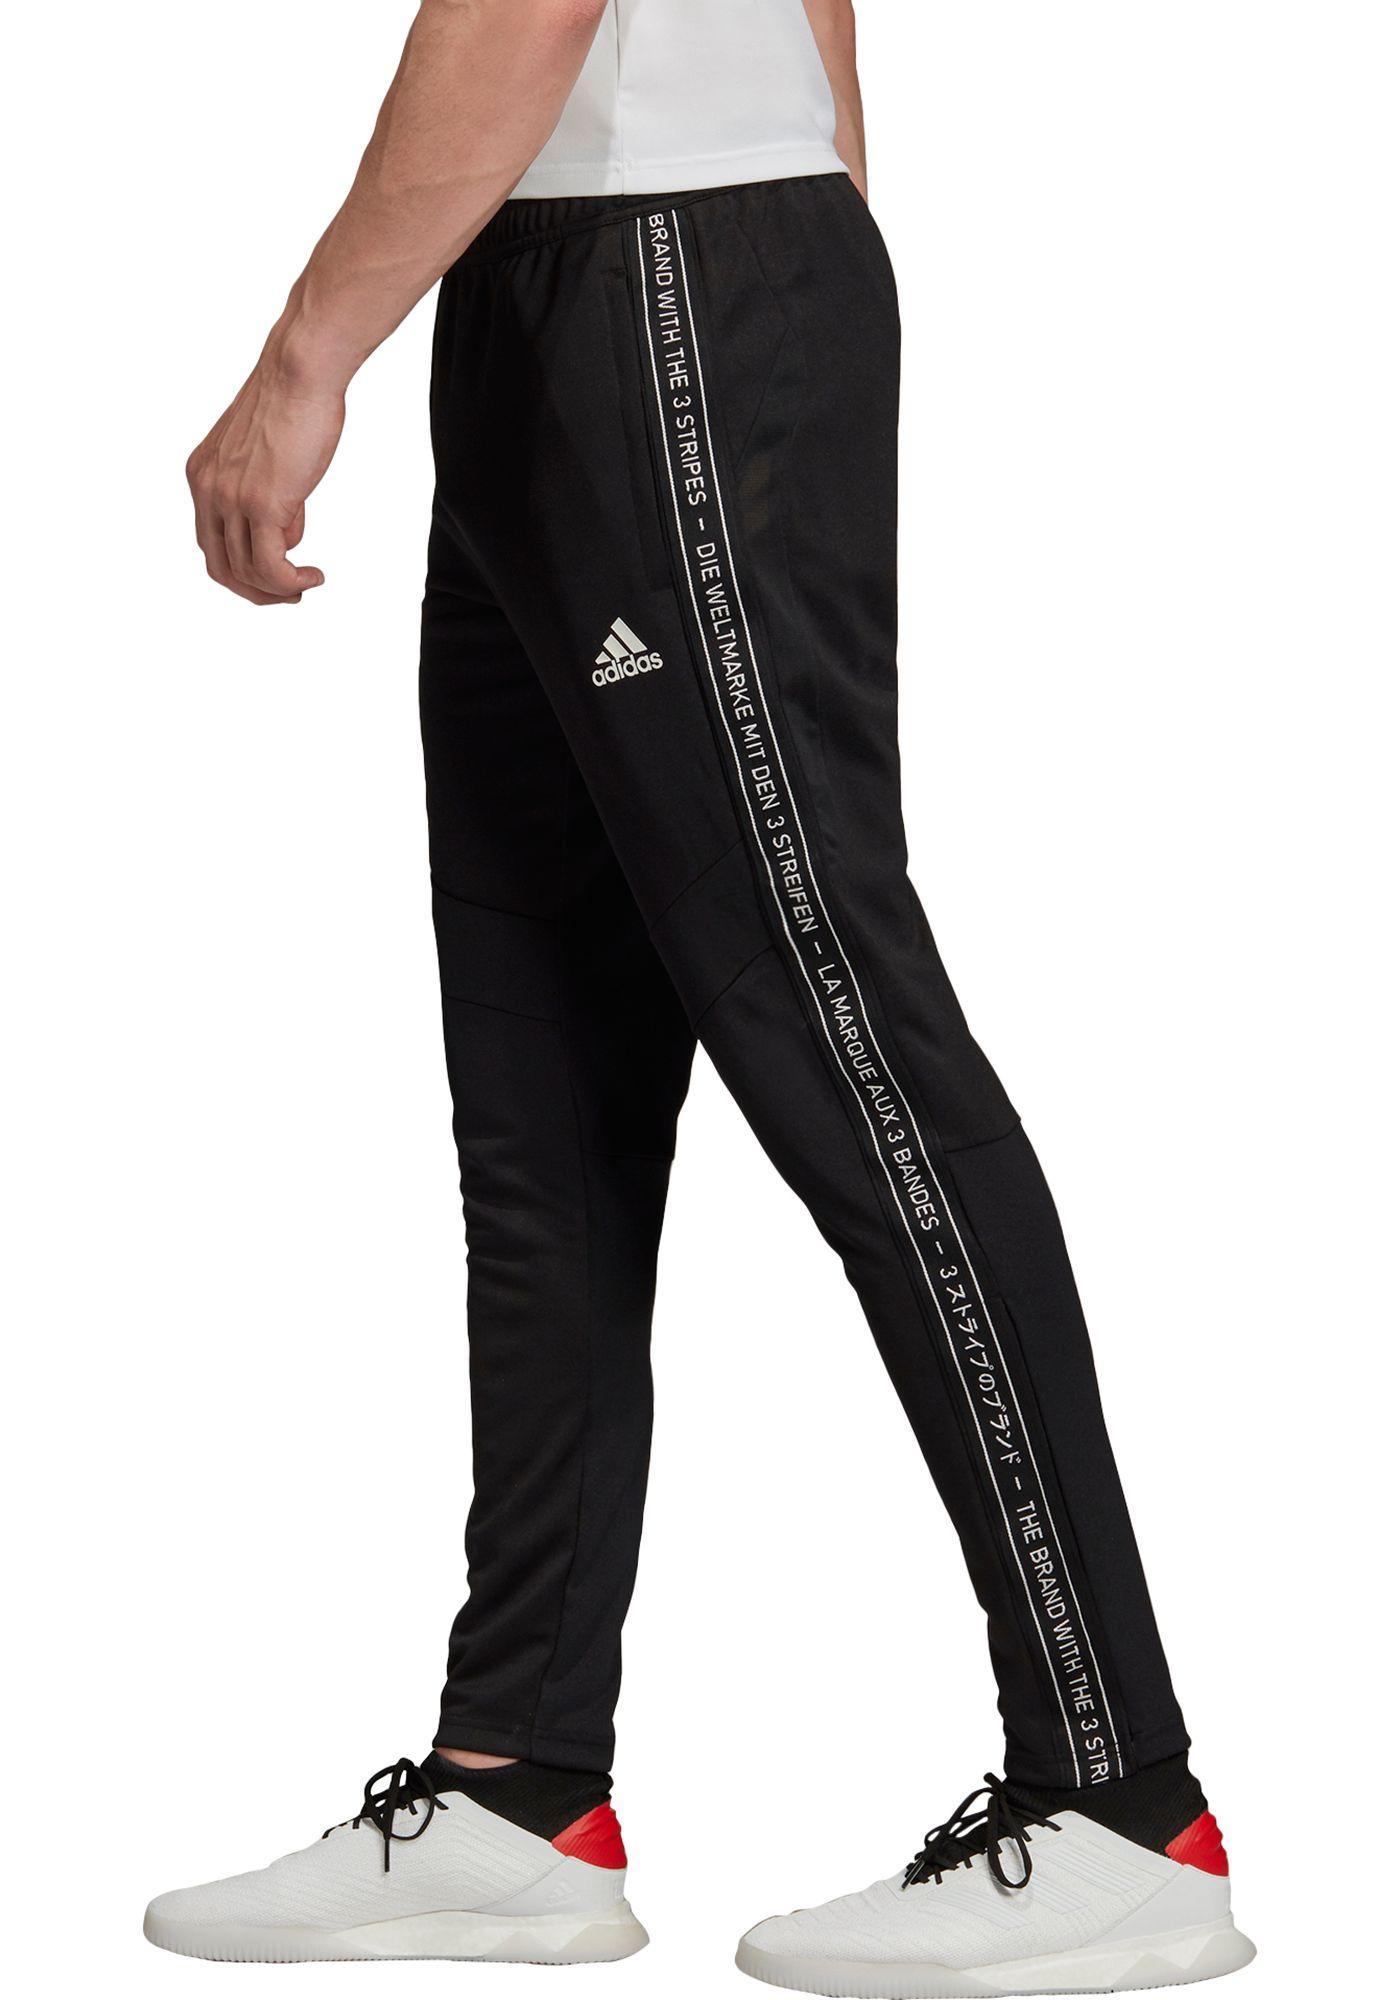 adidas Men's Tiro 19 Tape Training Pants (Regular and Big & Tall)